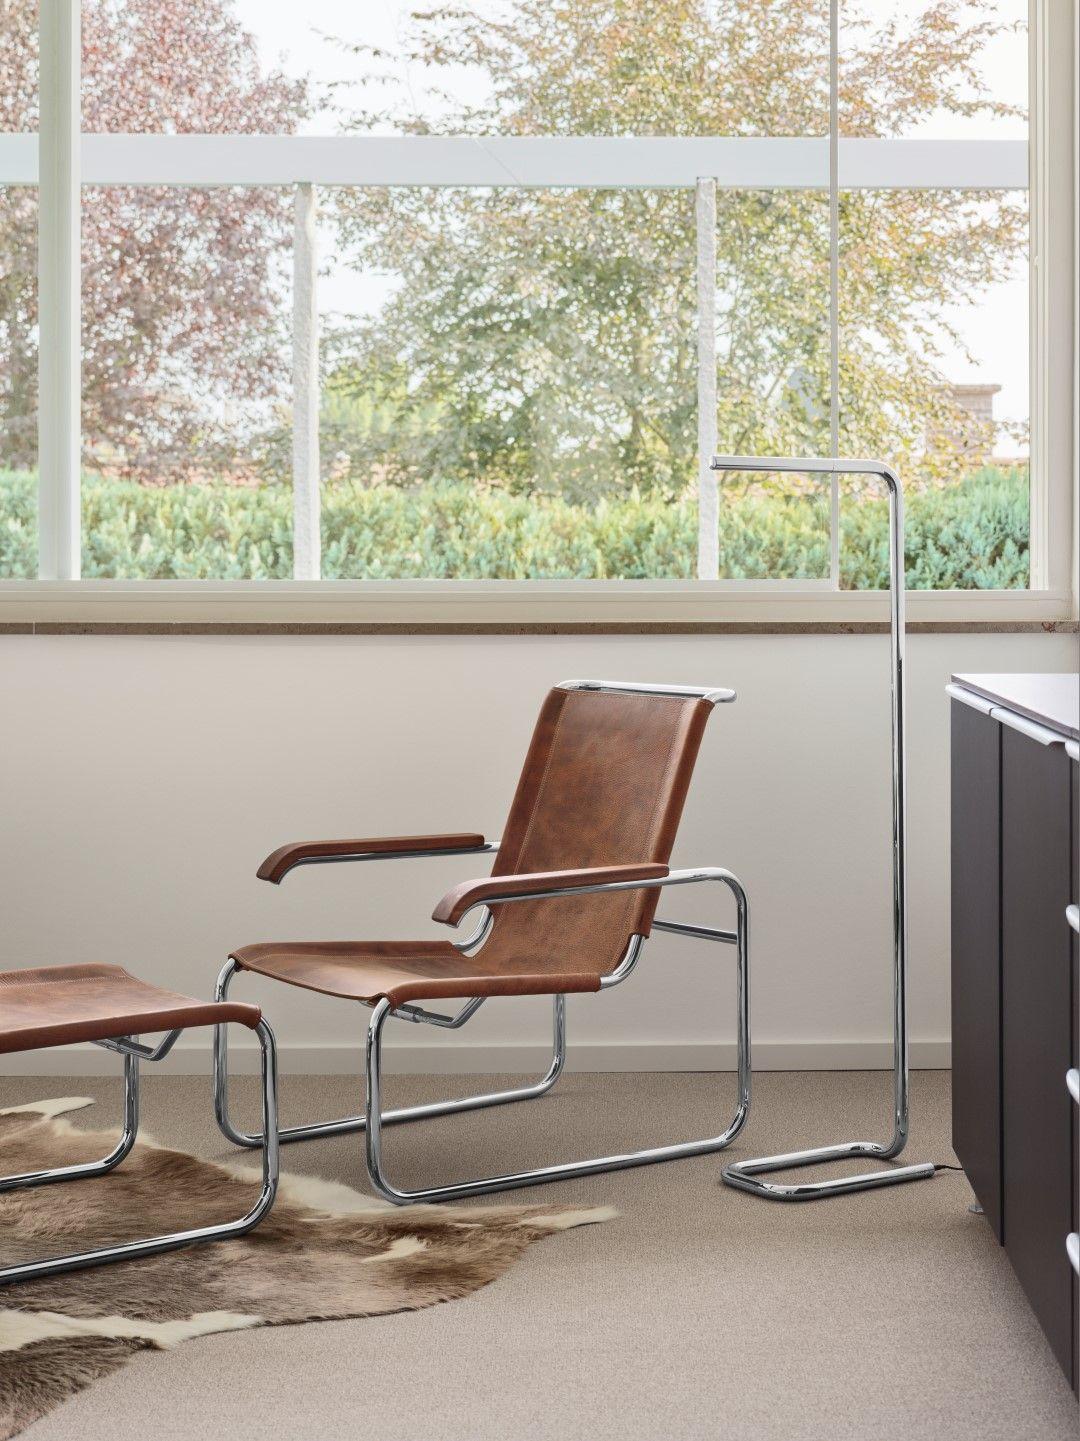 Fauteuil S35 | Thonet Vesta Design | Freischwinger